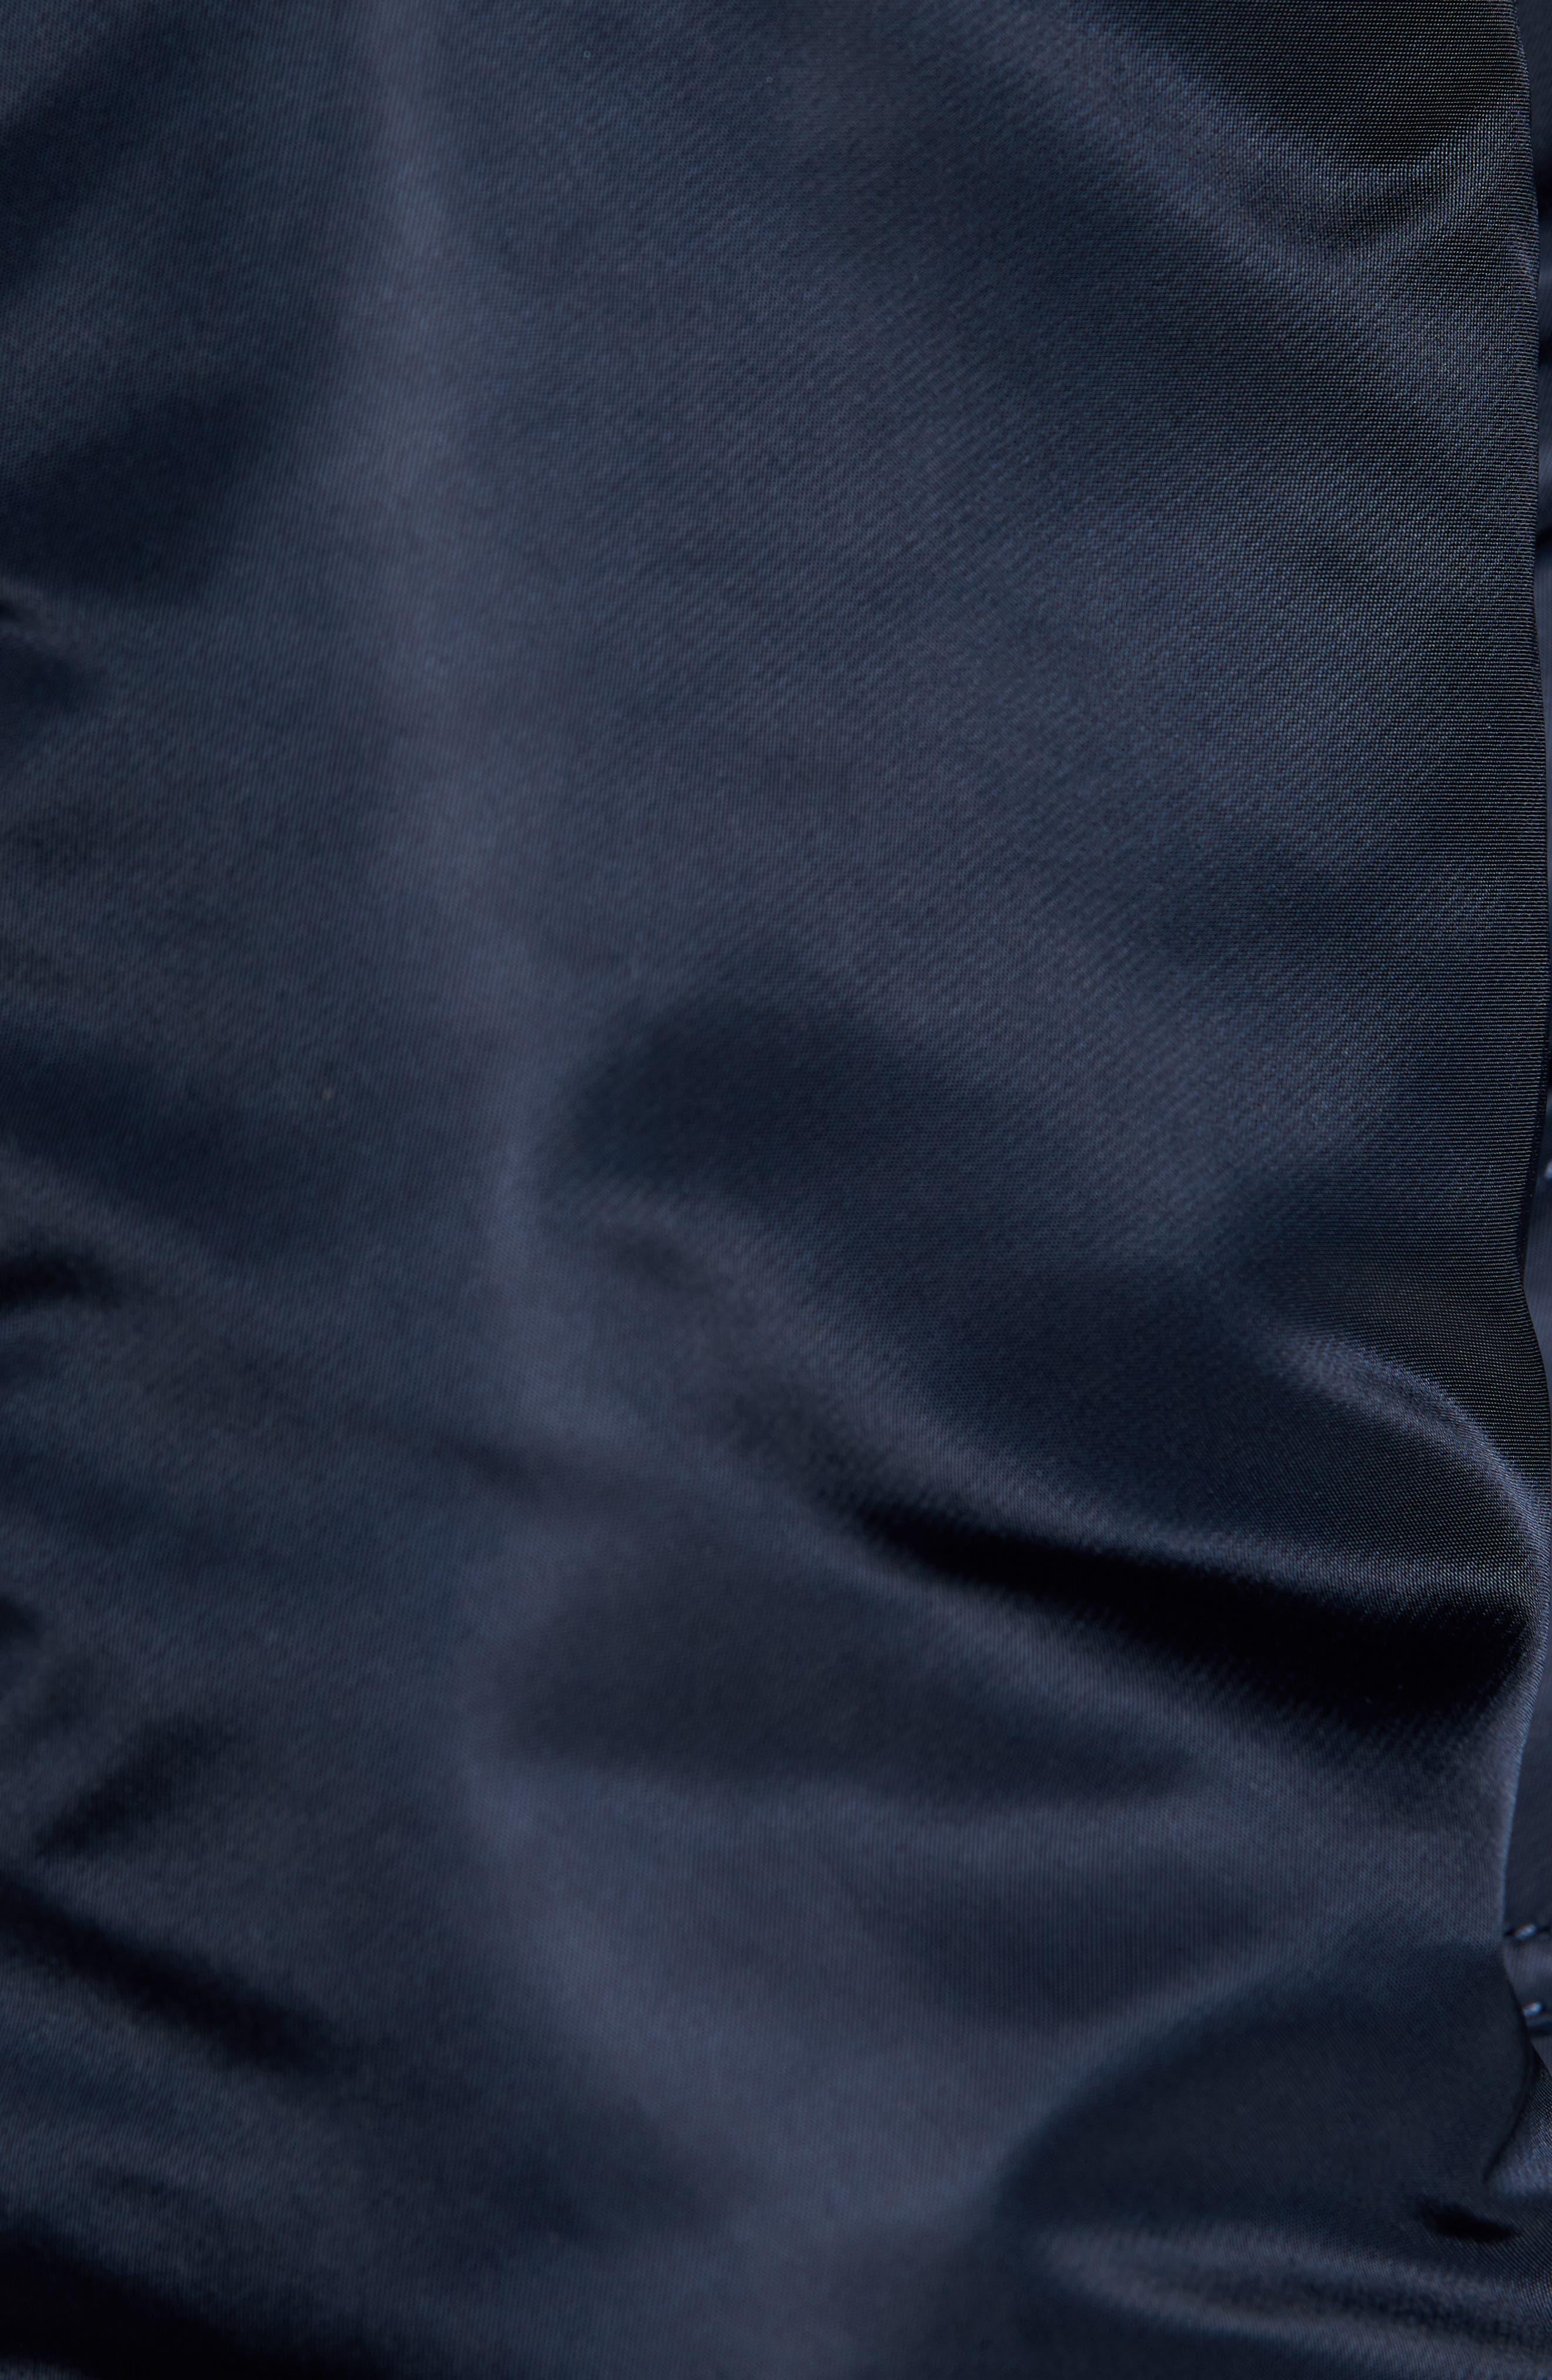 CWO 45/P Storm Cruise Jacket,                             Alternate thumbnail 5, color,                             Replica Blue